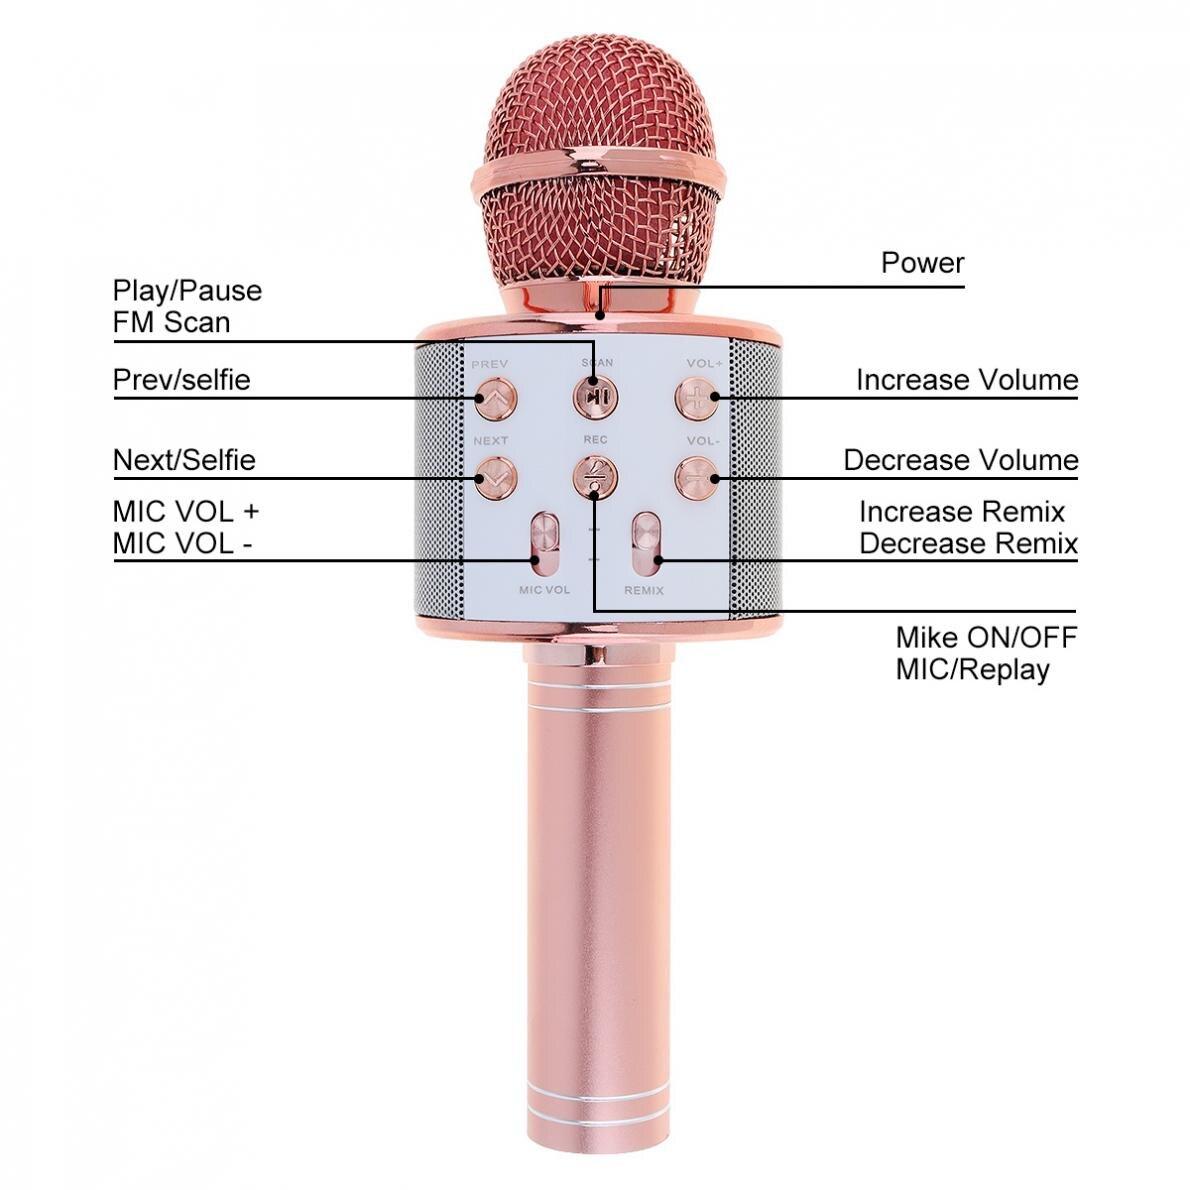 3 STÜCKE Mini 3,5mm Stereo Mikrofon Für PC Aufnahme Handy Studio Karaoke